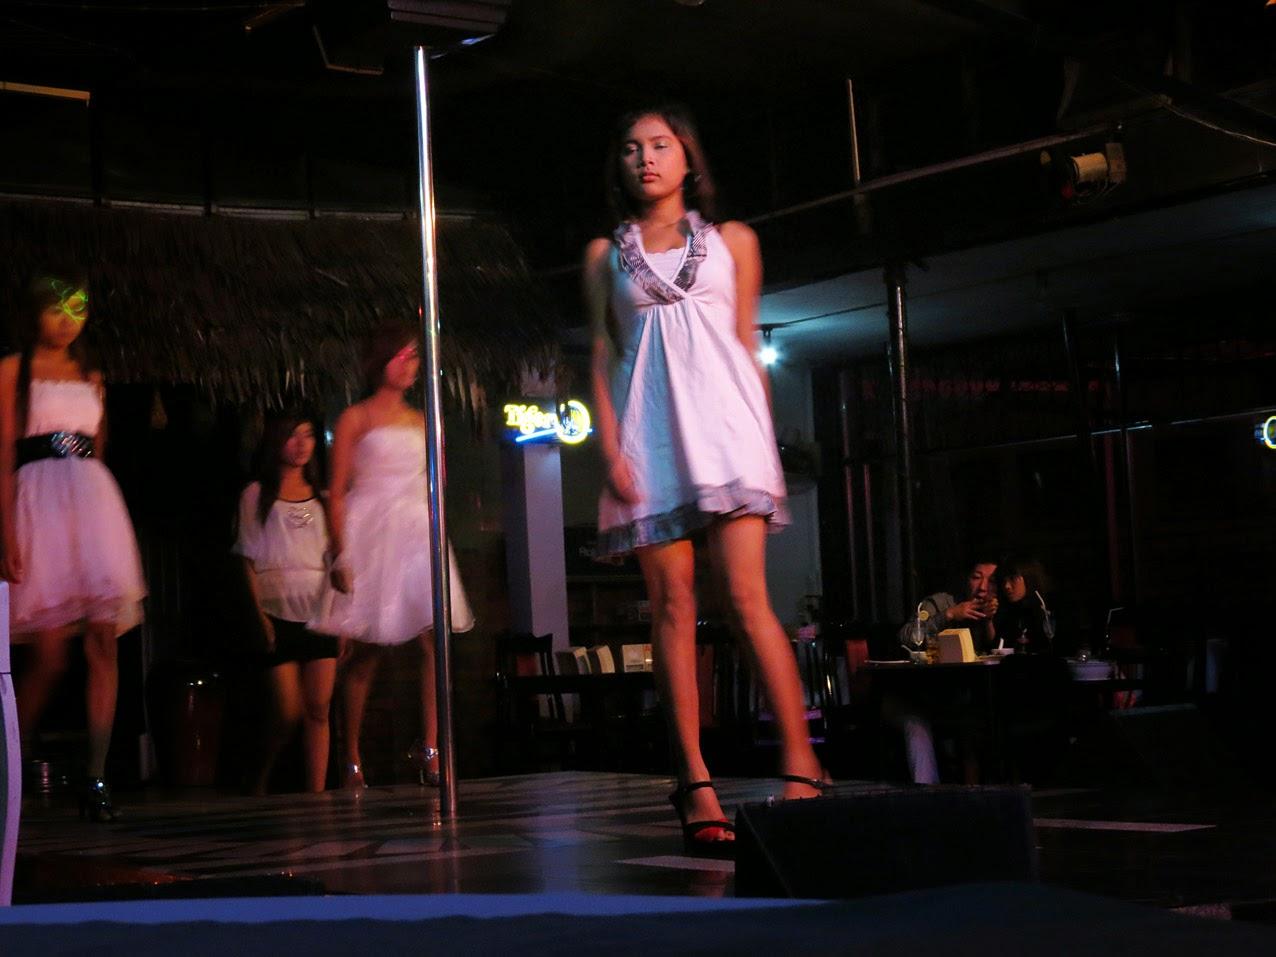 Nightclub ladies